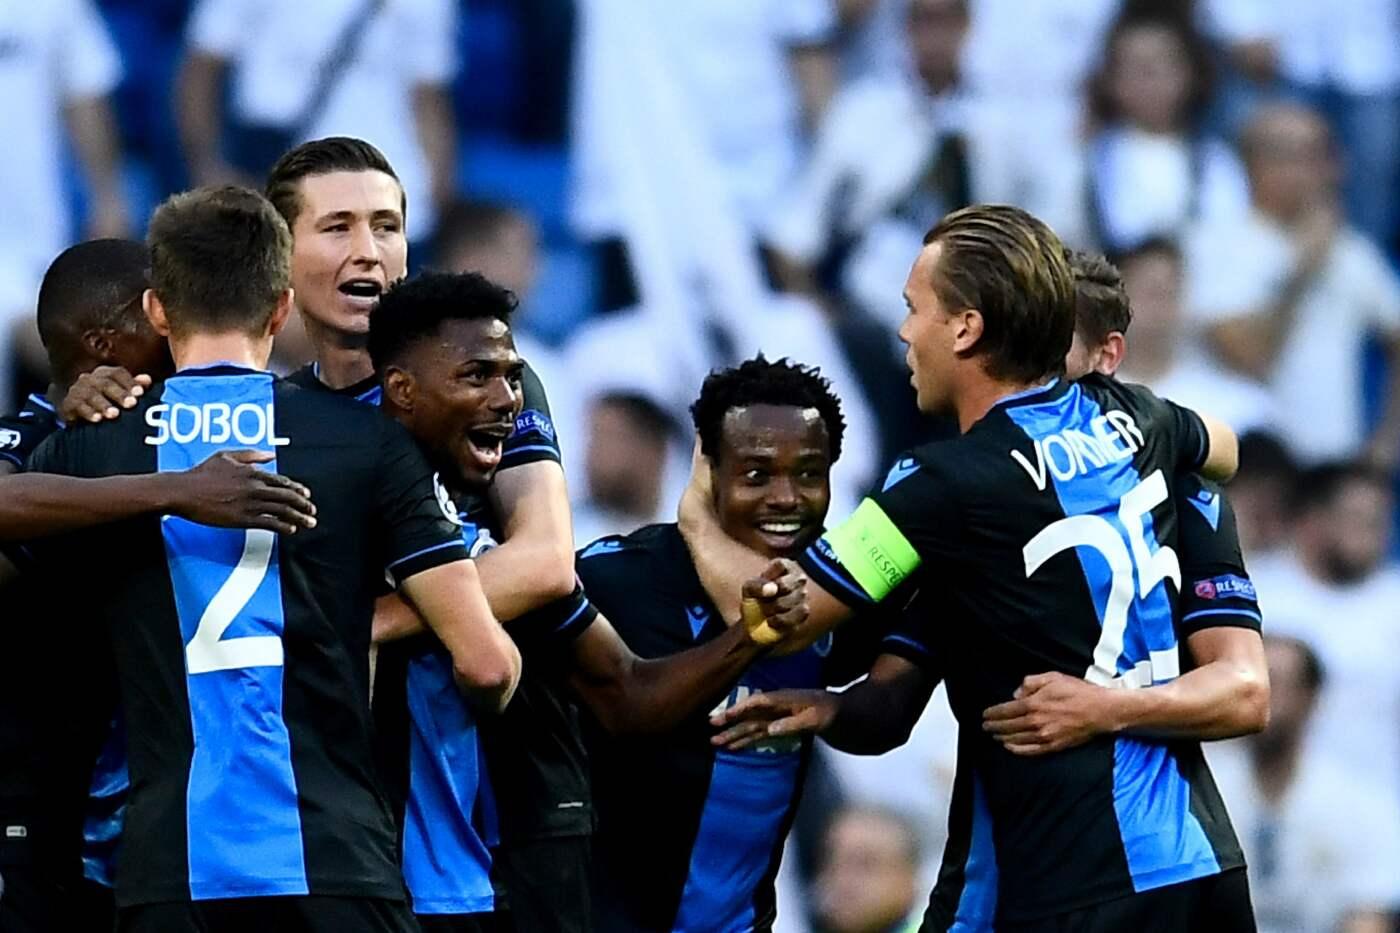 Jupiler League Belgio 6 ottobre: i pronostici e le quote